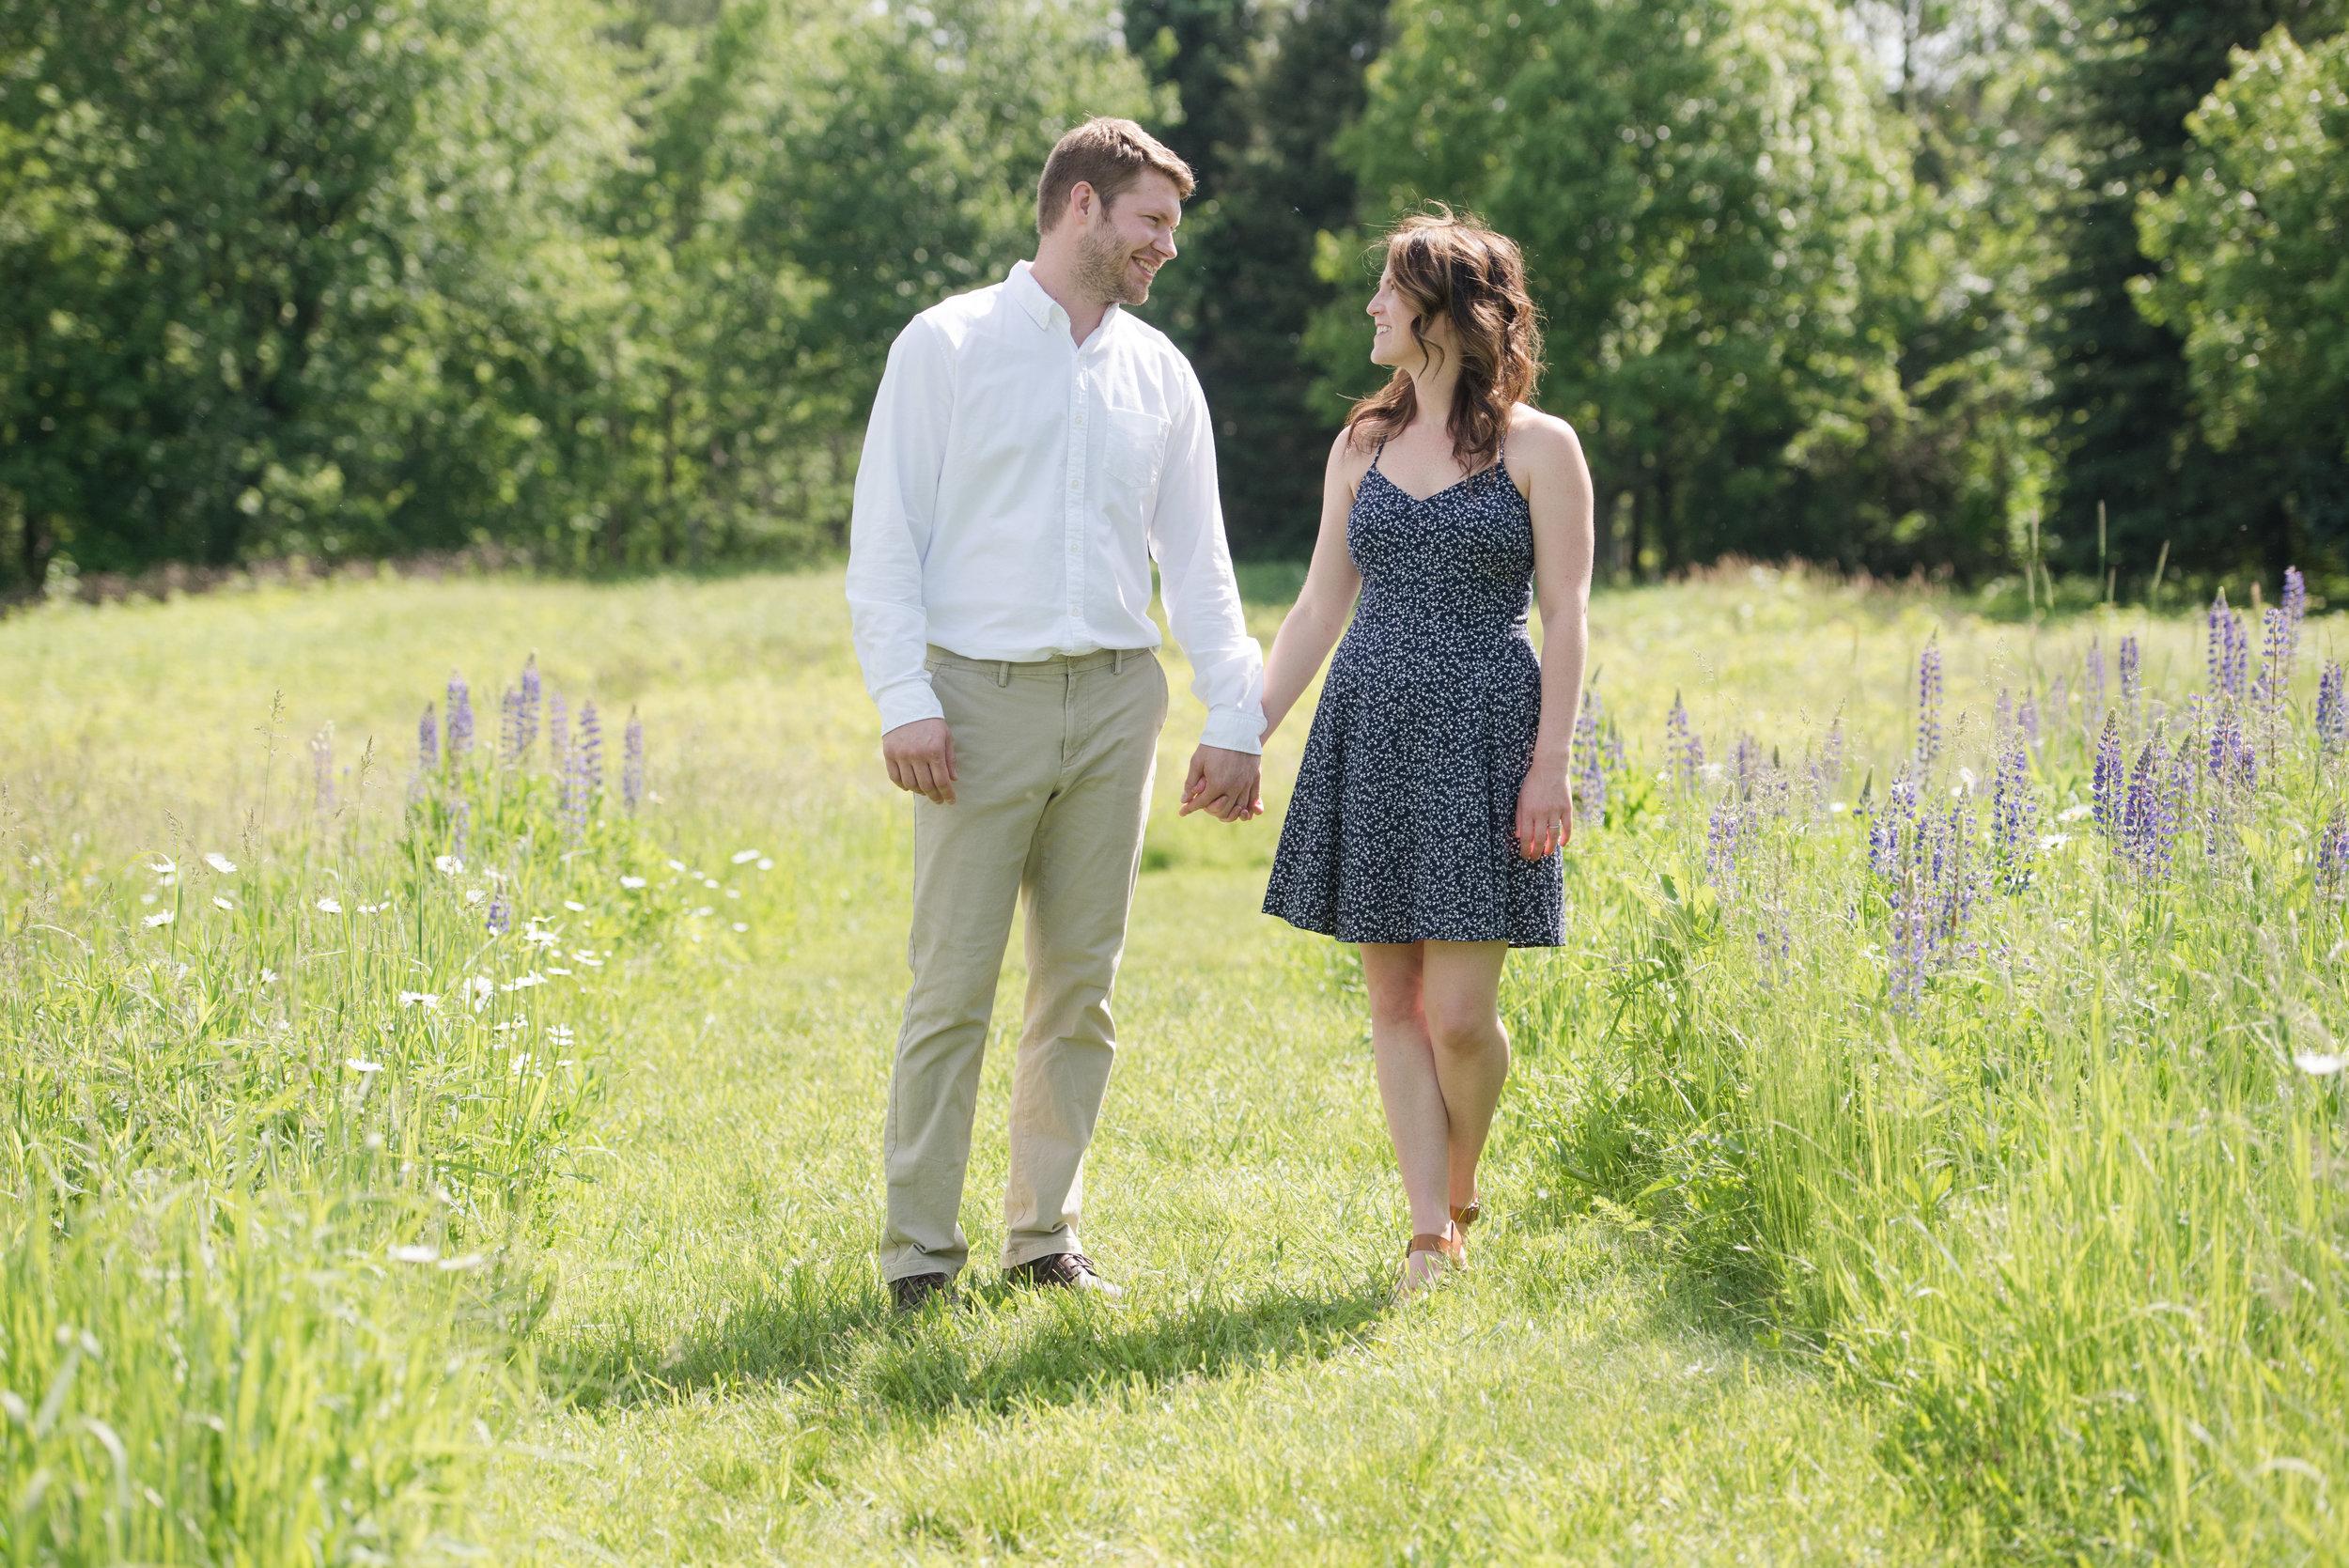 GALLERY-2019-6-9 Kaitlin, Justin & Liam Engagement 0587 77.jpg